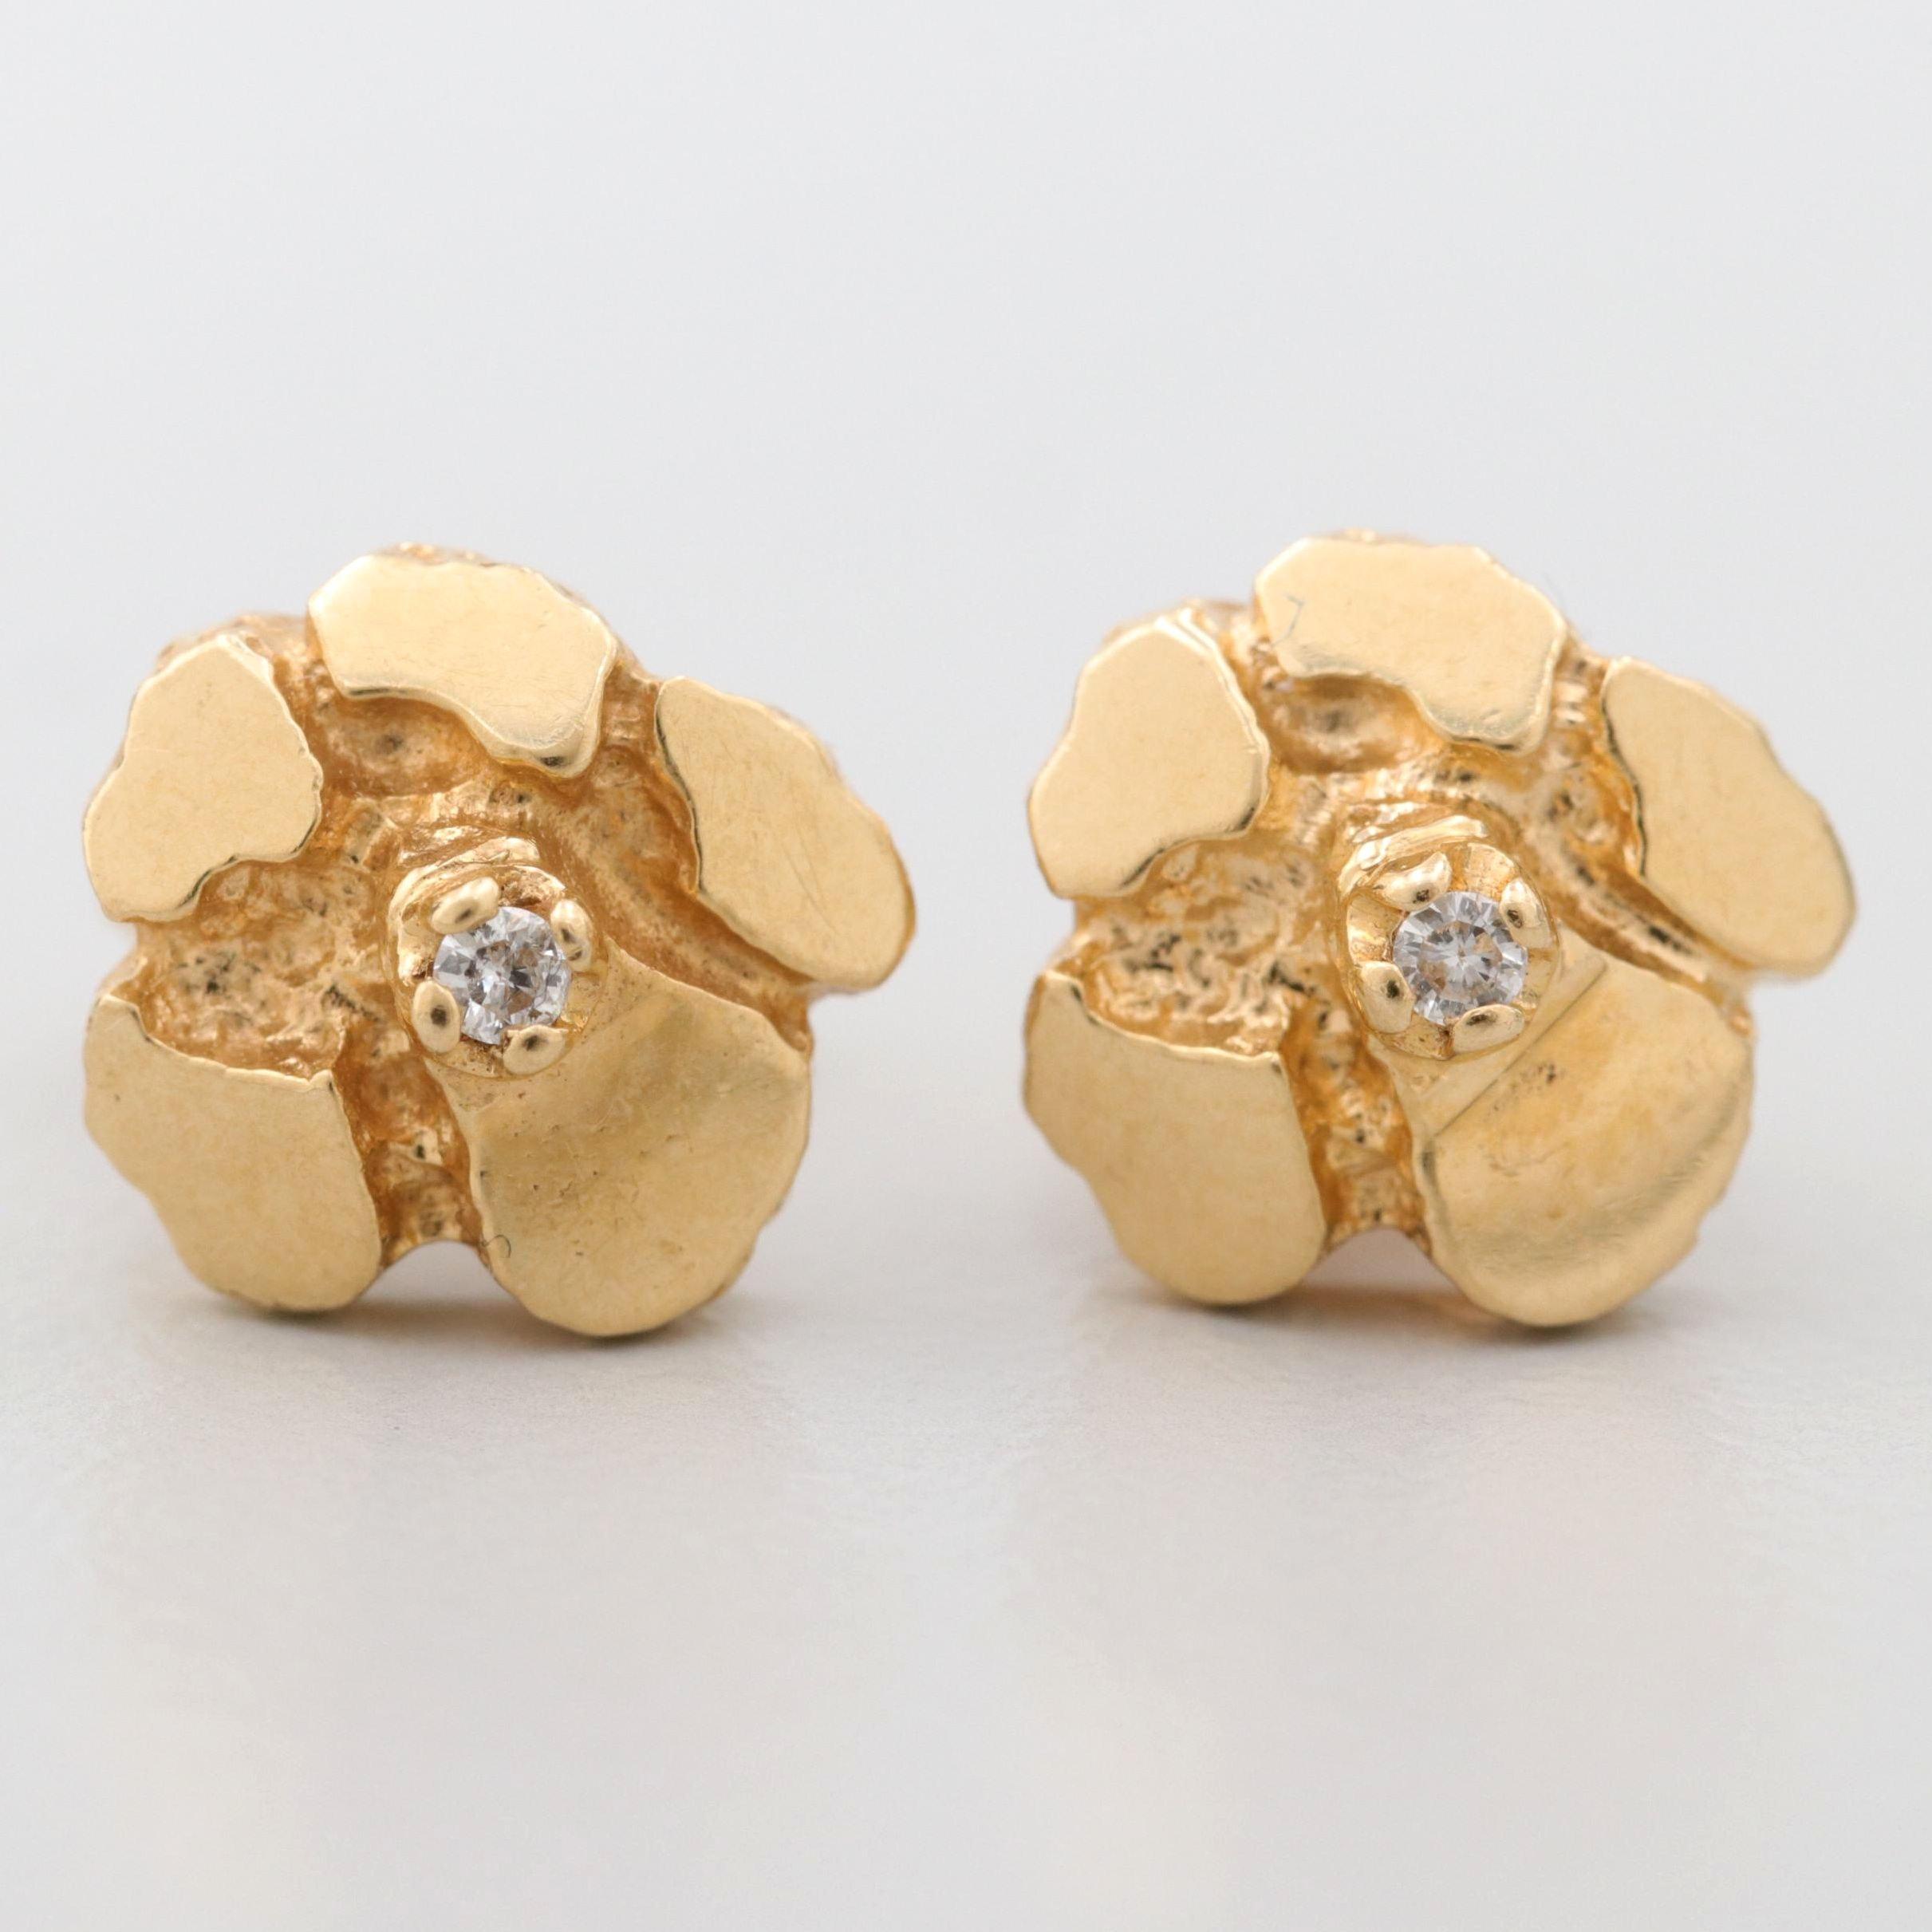 18K Yellow Gold Nugget Diamond Stud Earrings